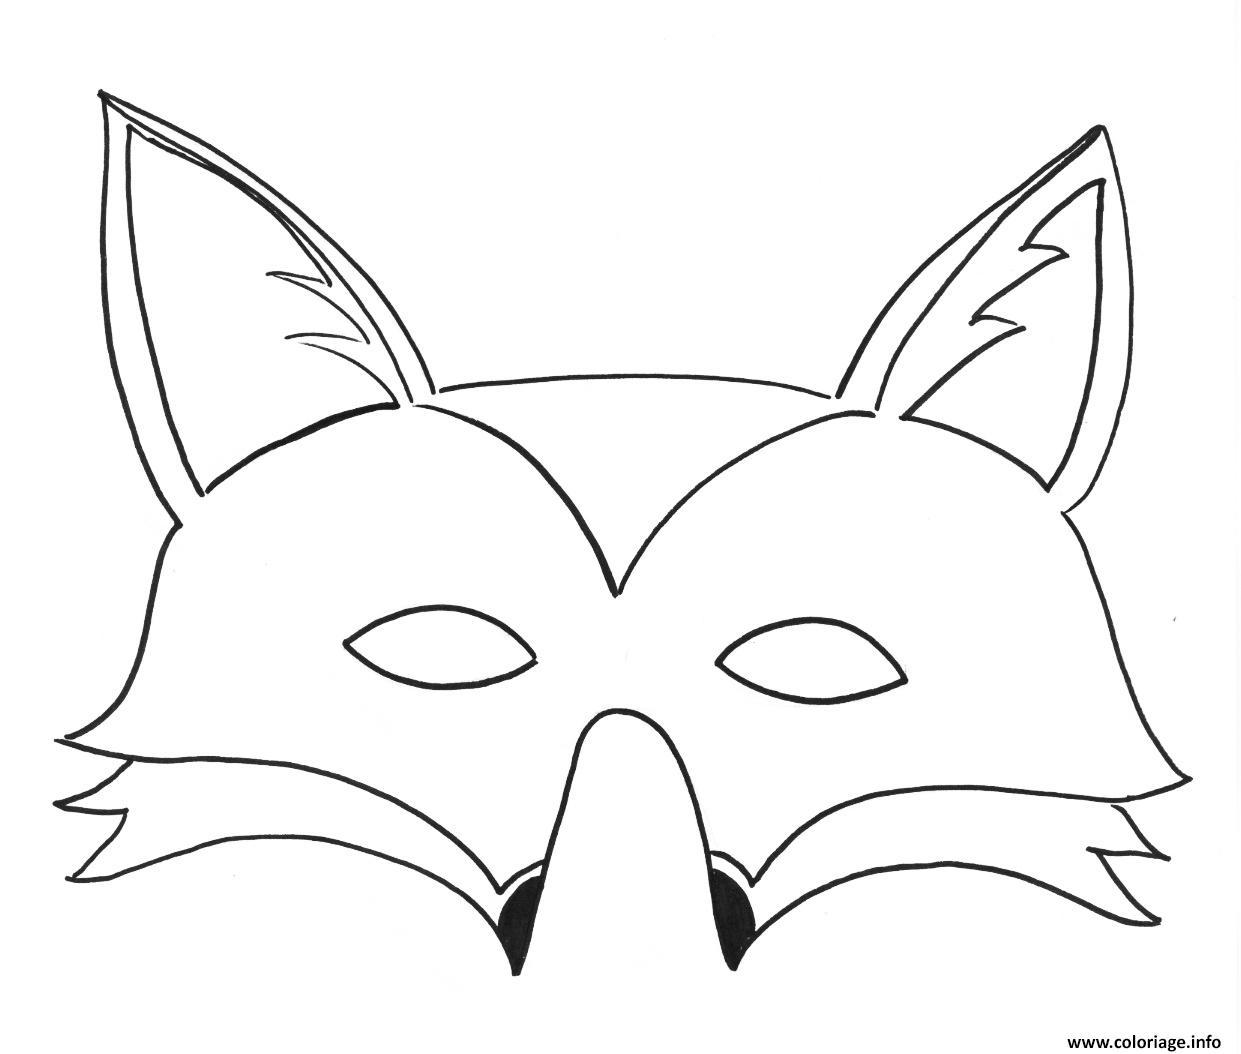 Coloriage masque de renard   JeColorie.com